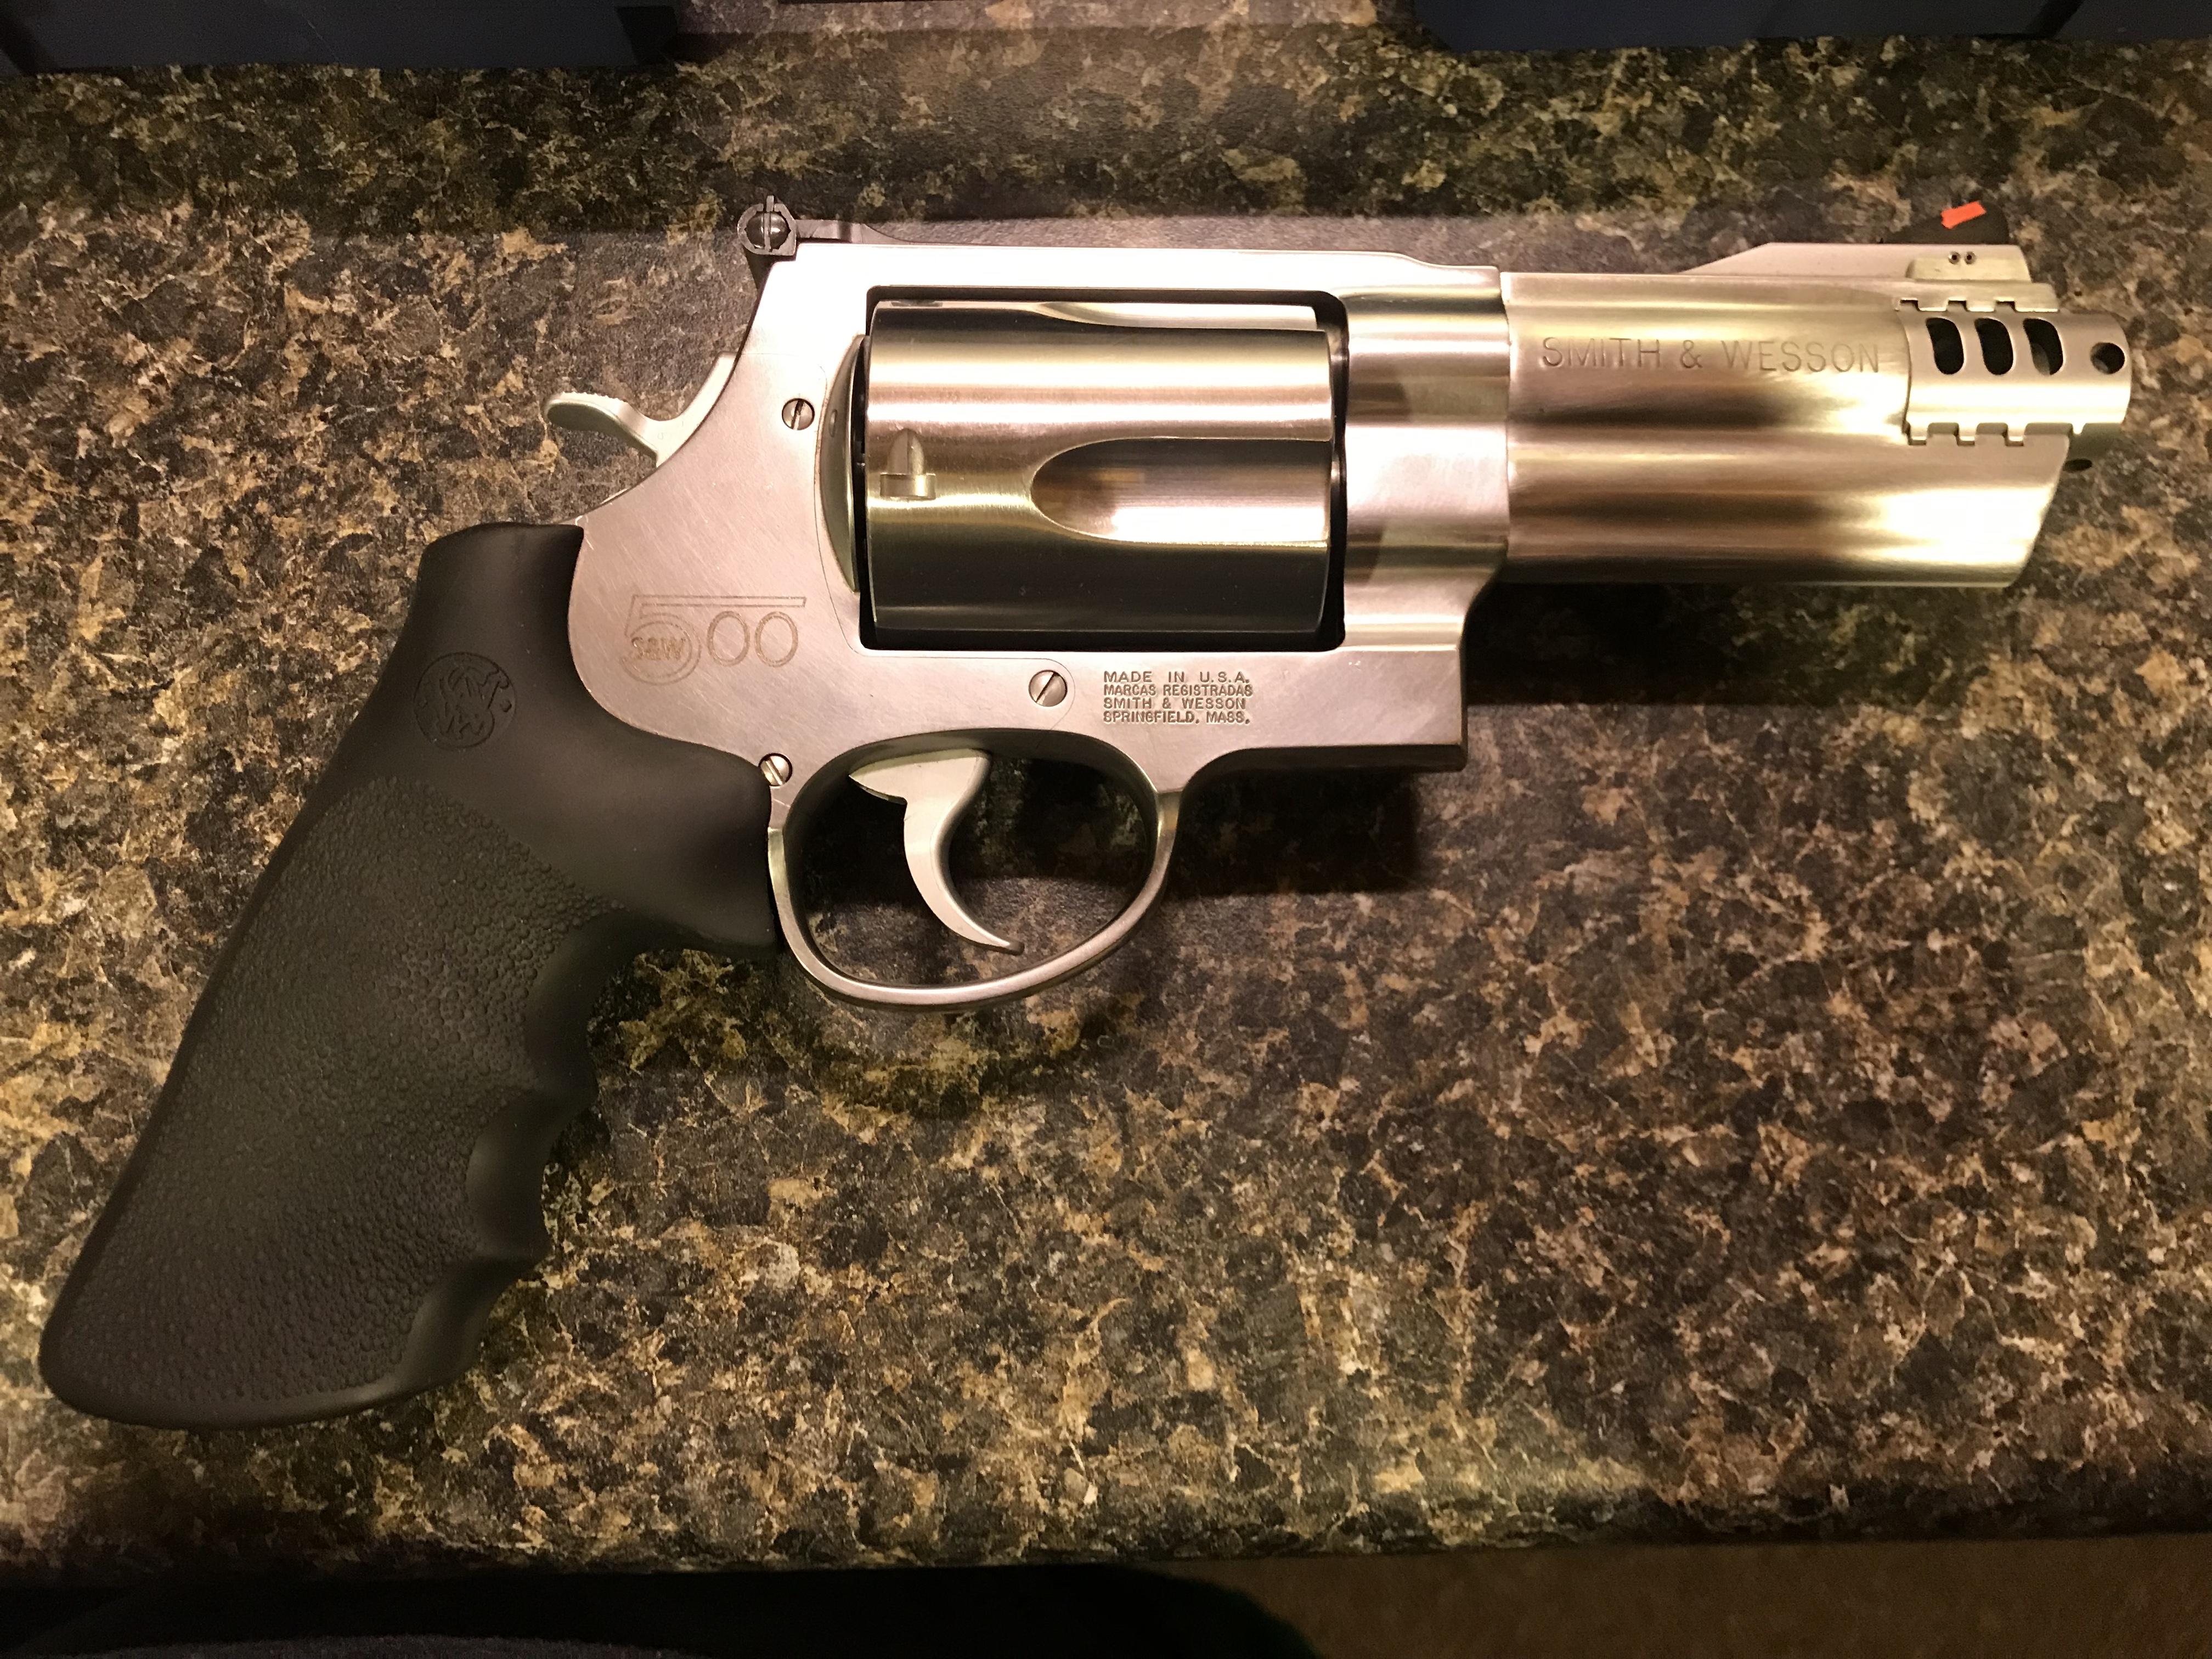 WTS:  S&W 500 Stainless Revolver-39e63769-e913-49e1-80f5-788aa52e6ece.jpeg